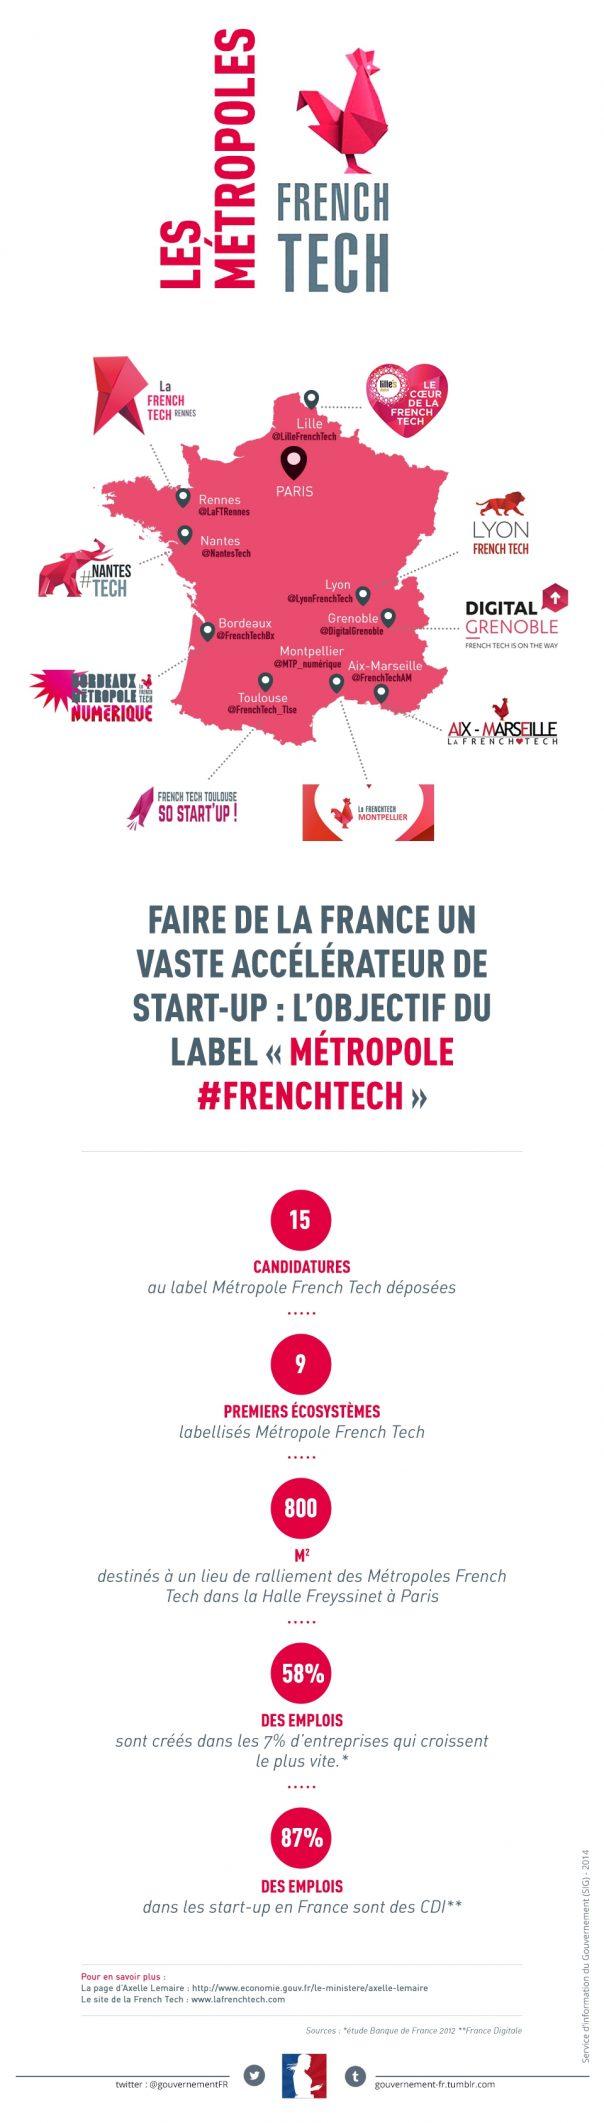 French Tech : Métropoles